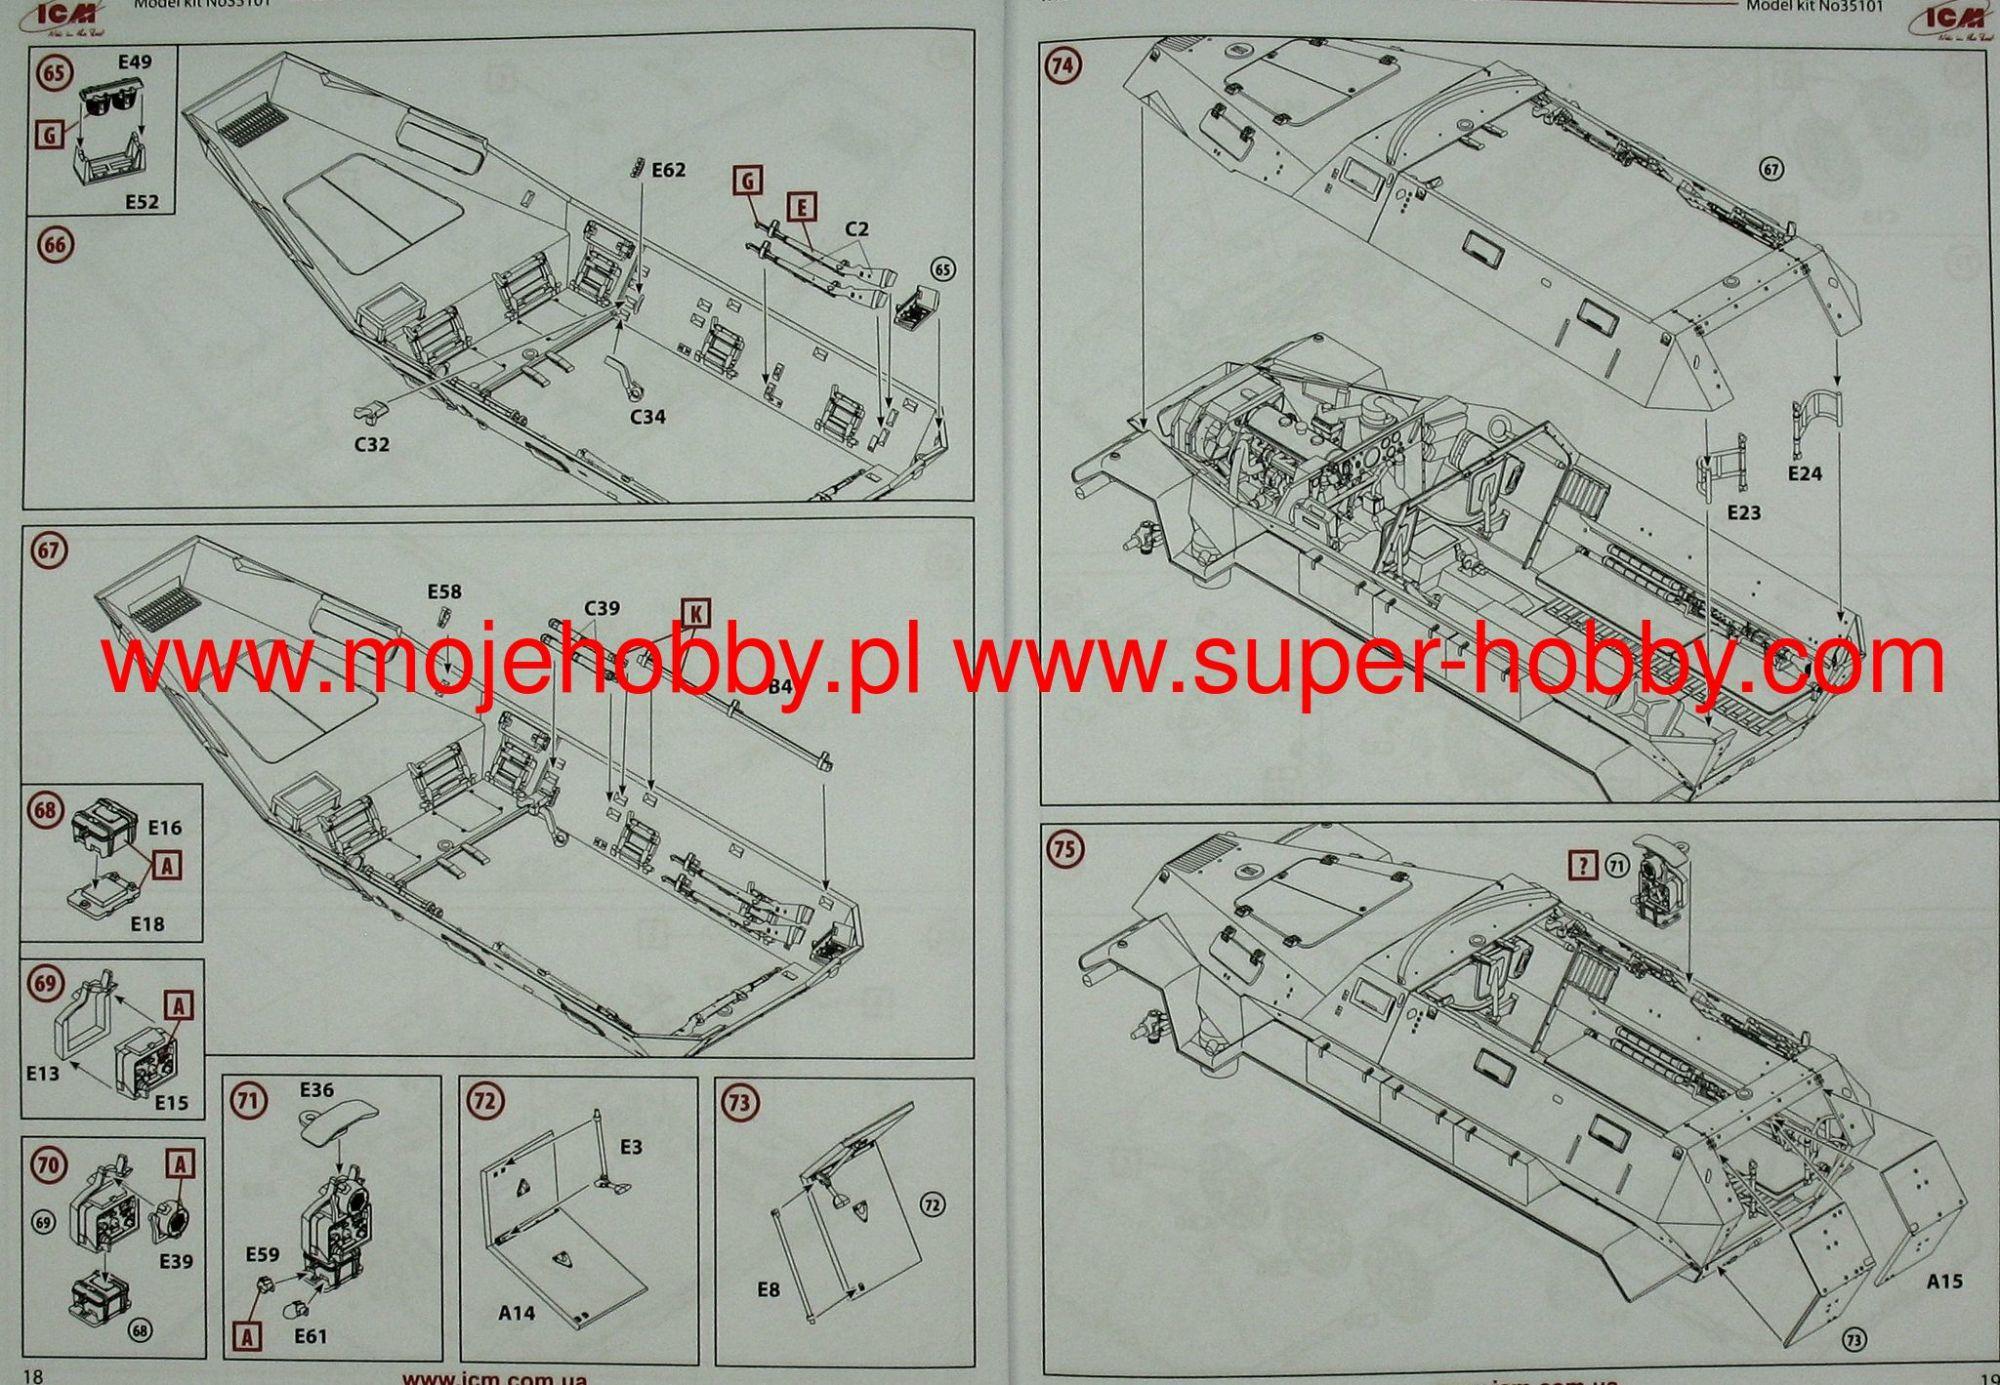 hight resolution of icm 251 wiring diagram wiring diagram fascinating icm 251 wiring diagram